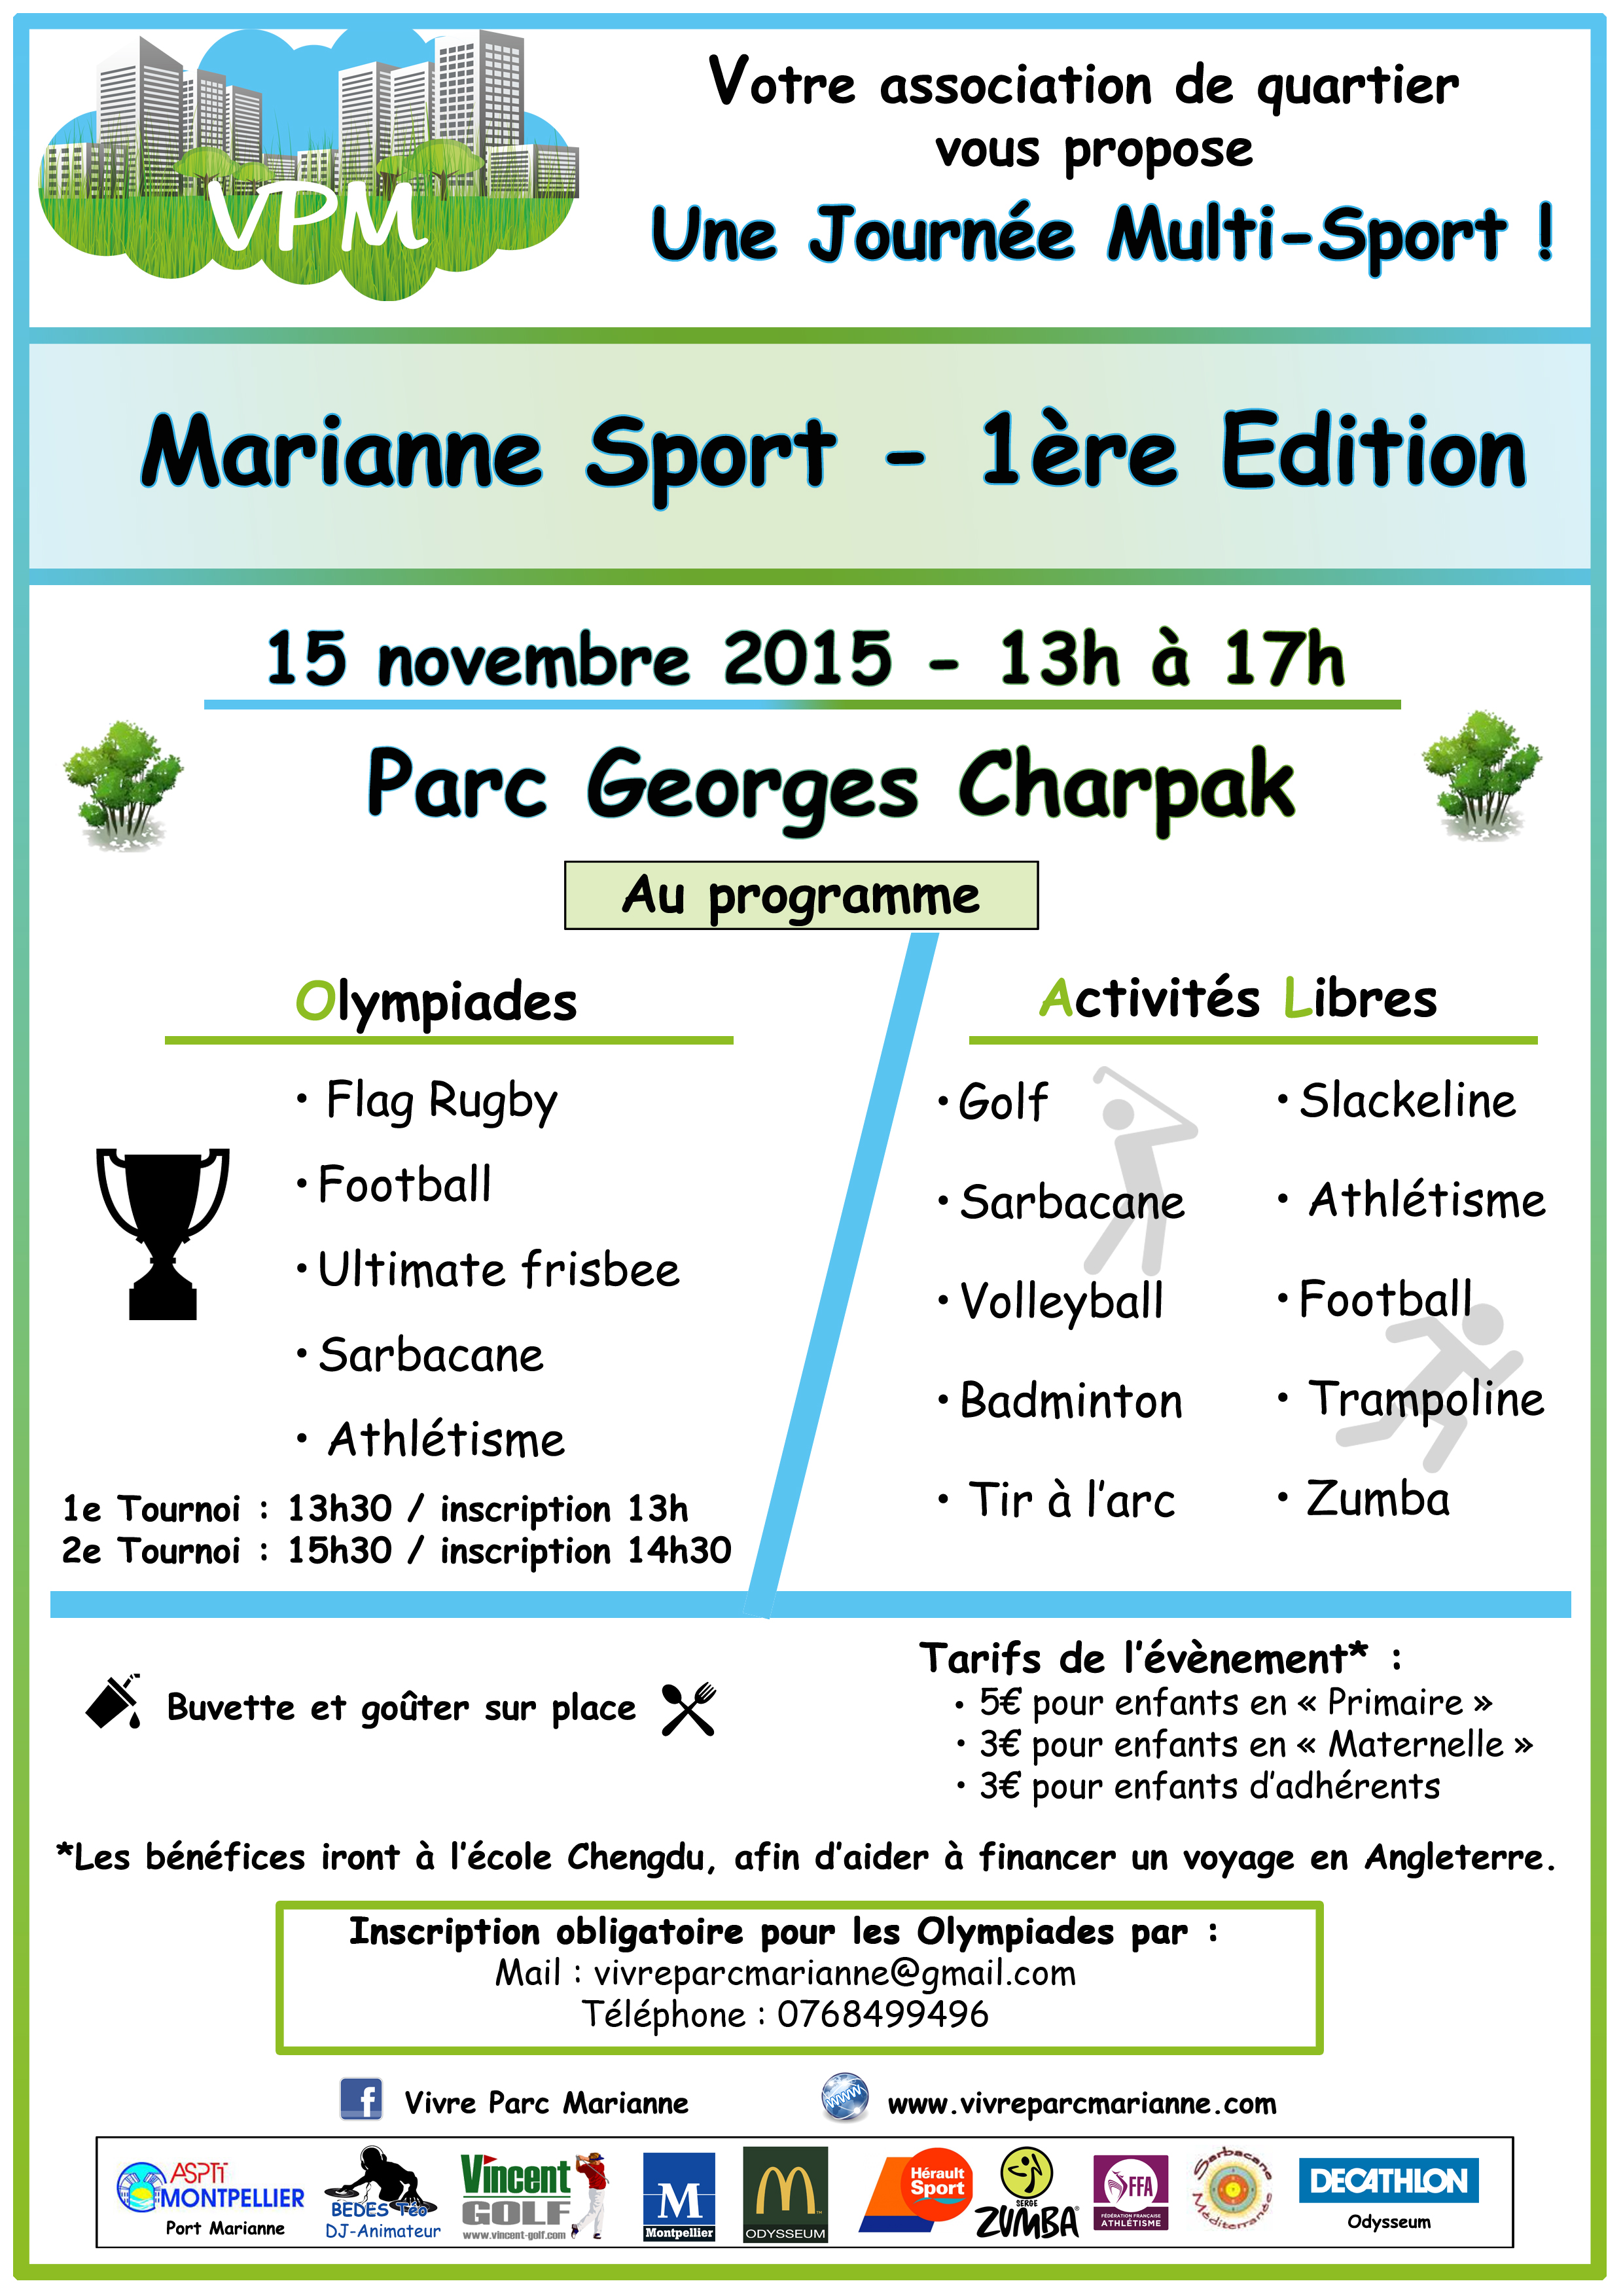 Marianne Sport 15 novembre 2015